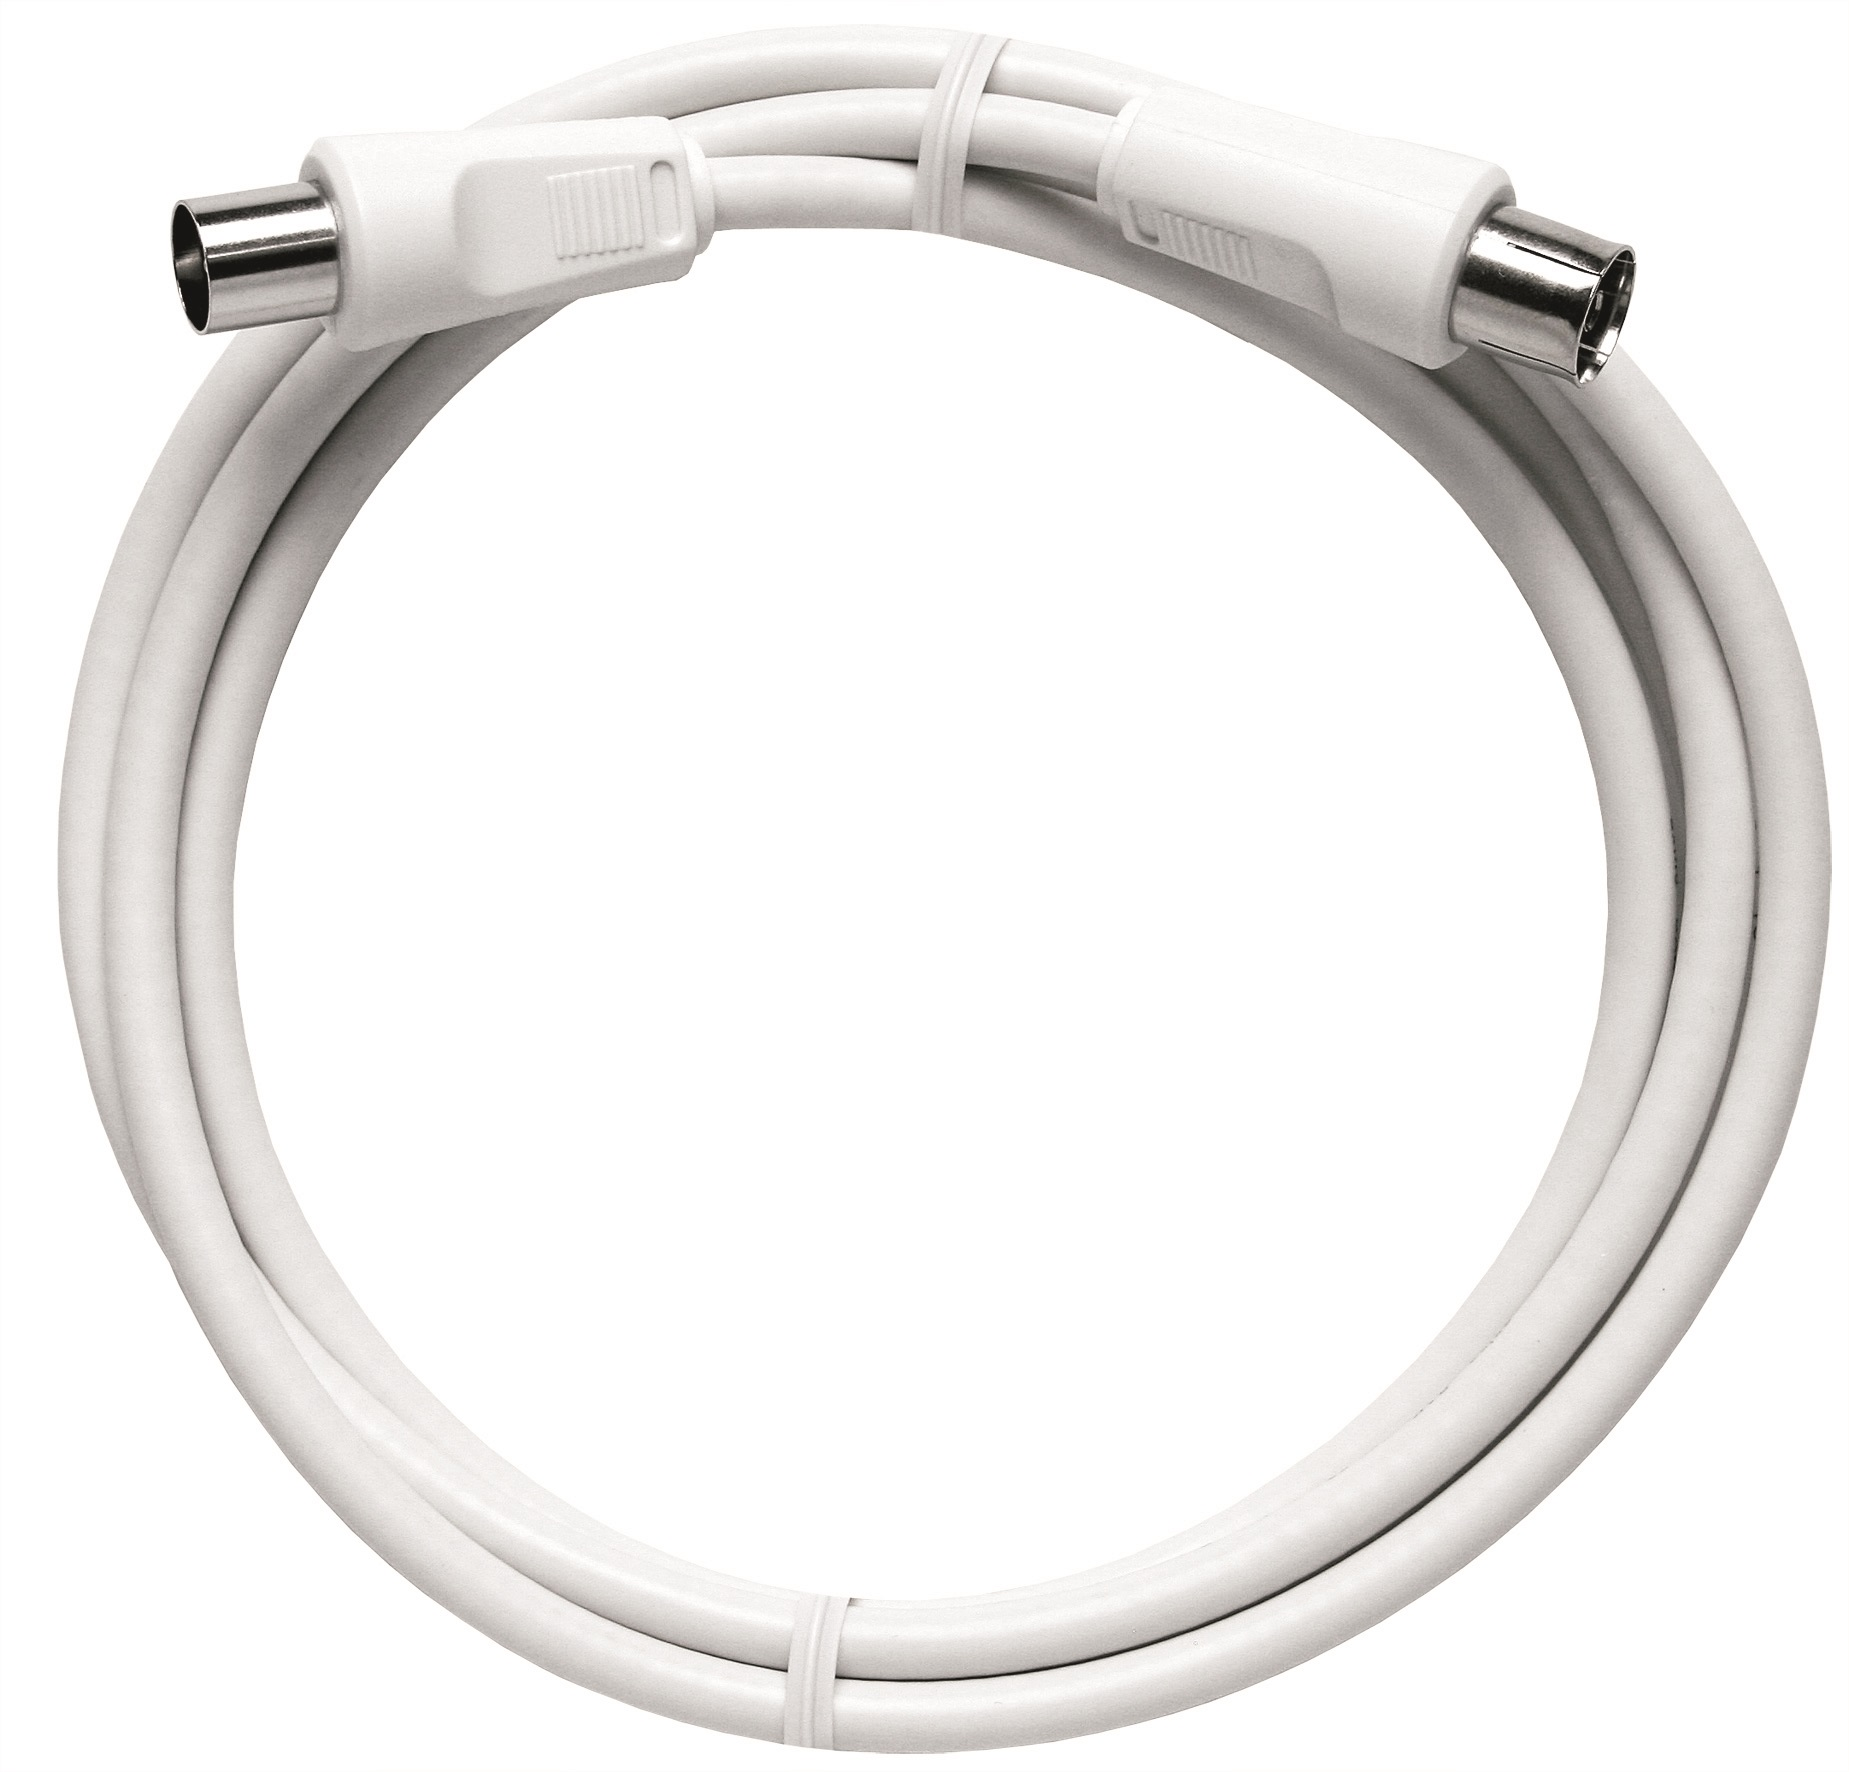 1 Stk BK Koax Patchkabel IEC-M/IEC-F,ger.,Cl.A,ws, 1,5m,BAK 150-90 HSBKPIG1K5